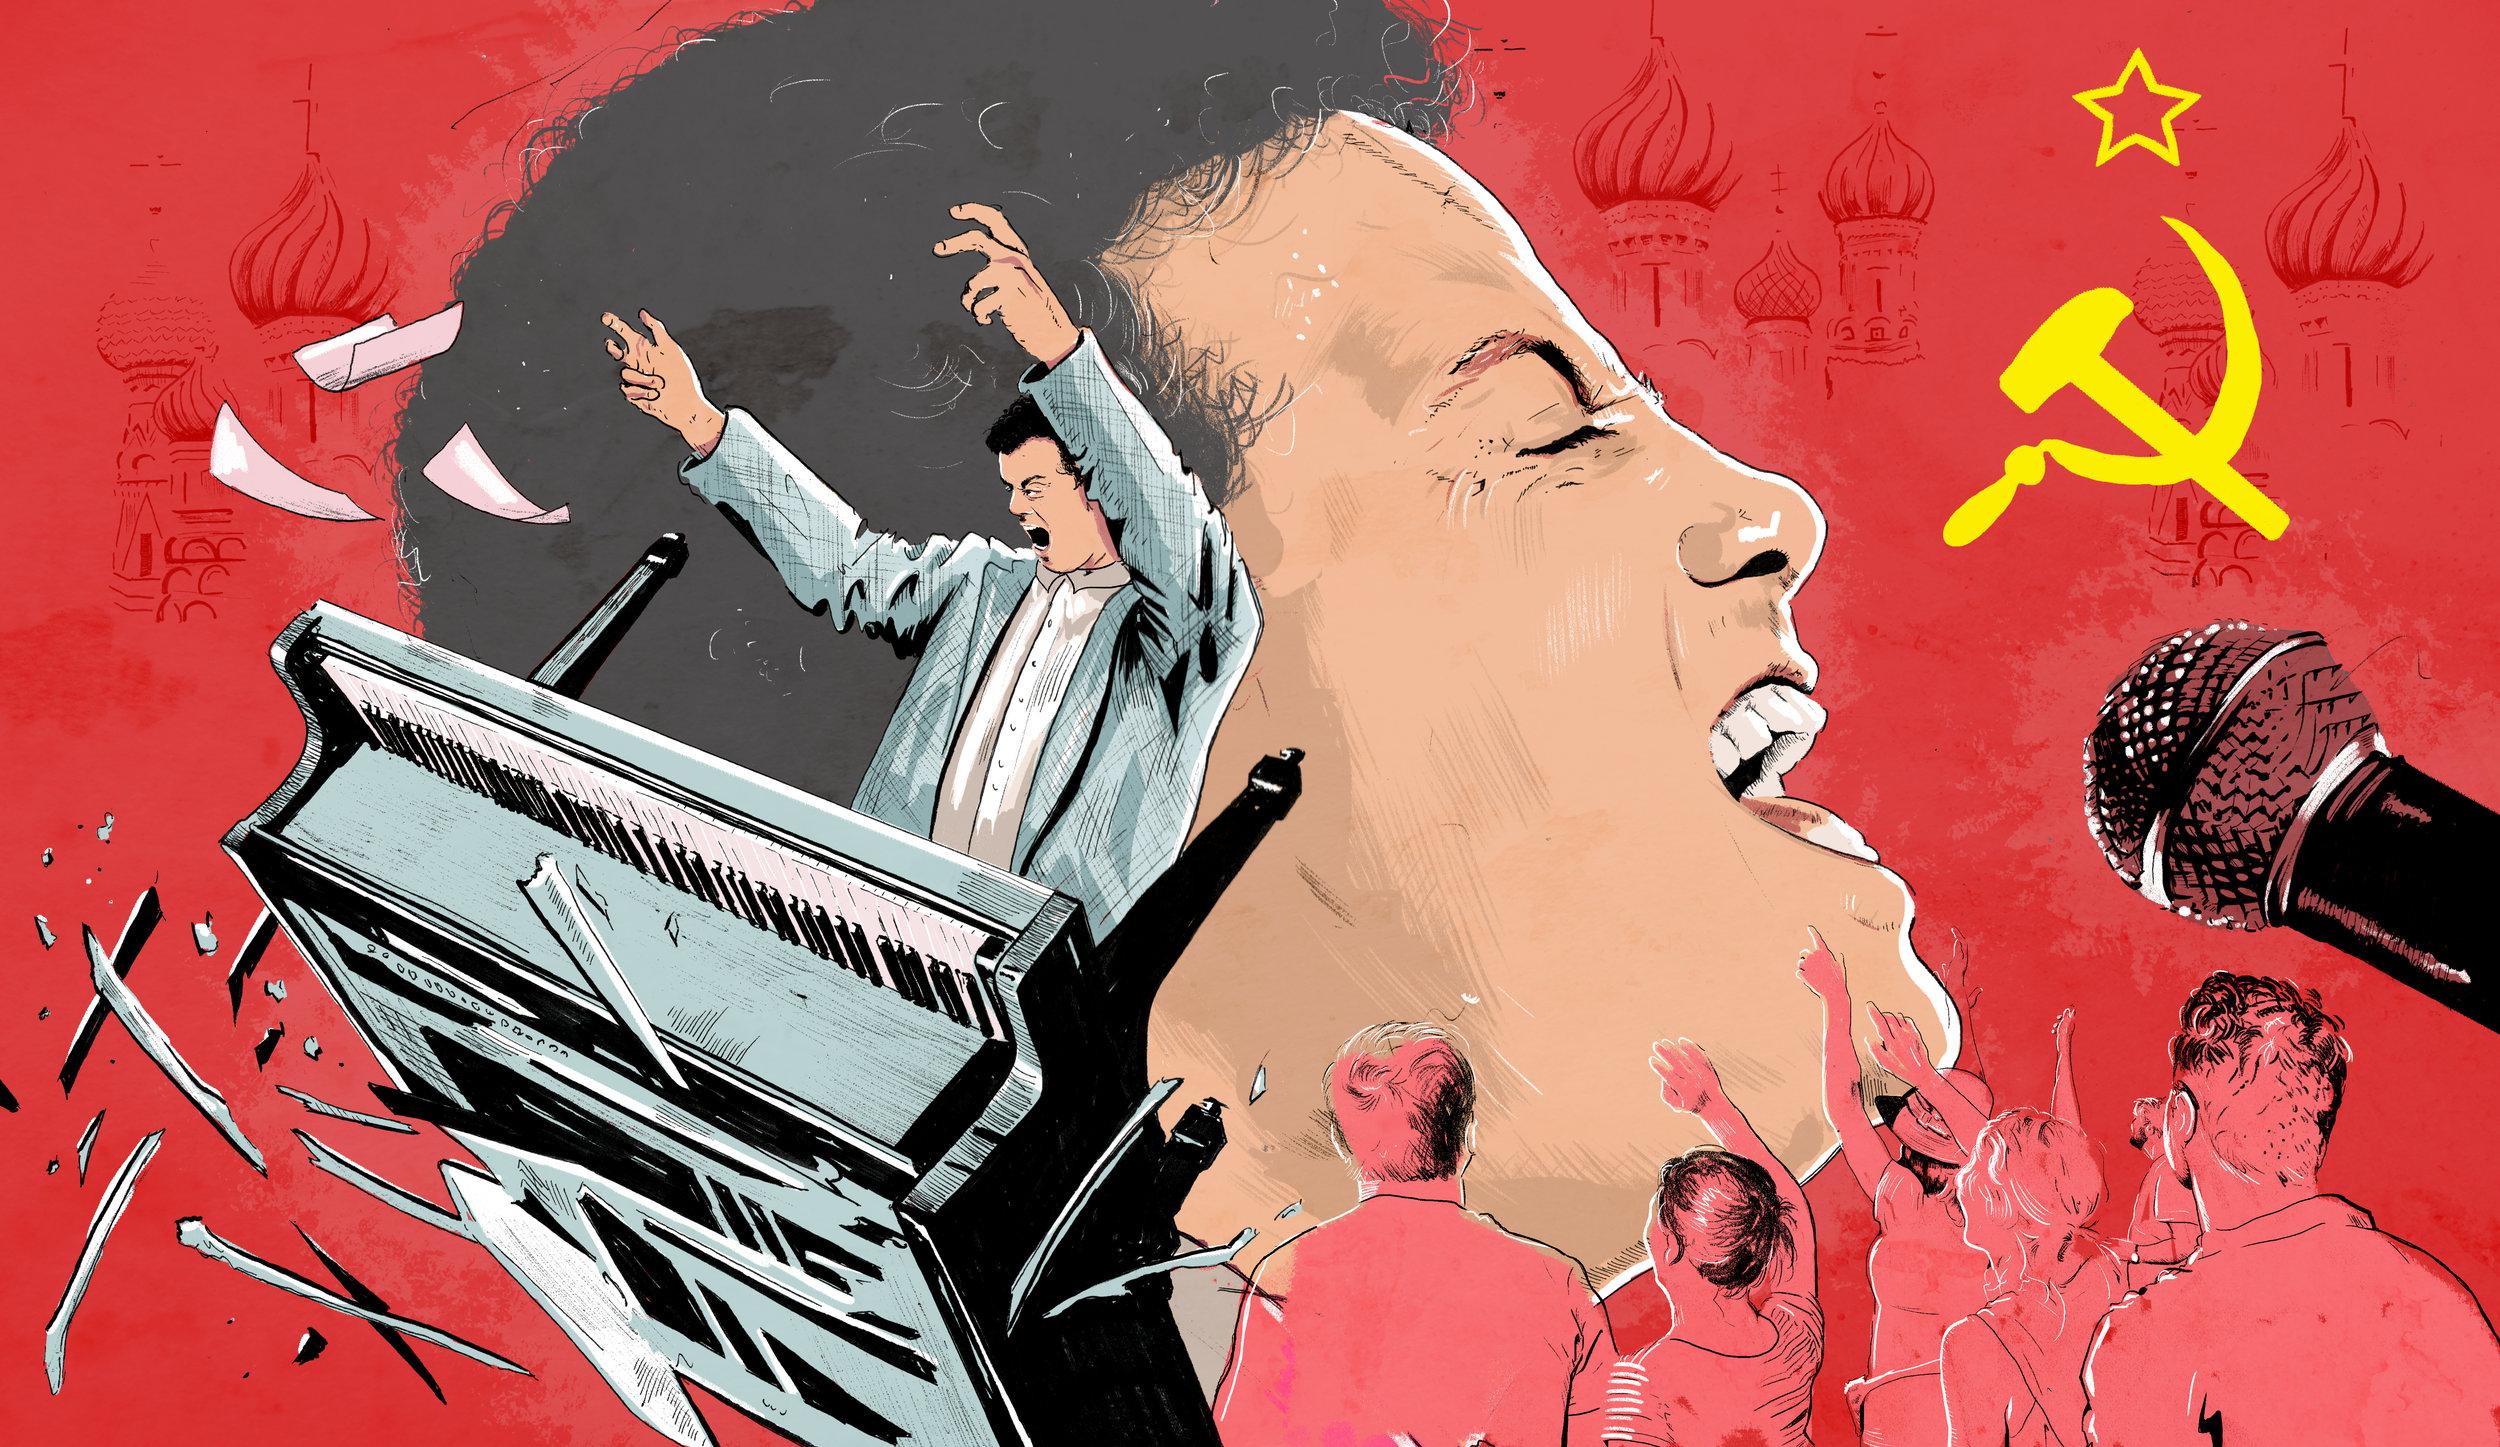 30 Years Ago, Billy Joel Had a Meltdown in Moscow by Dan Ozzi